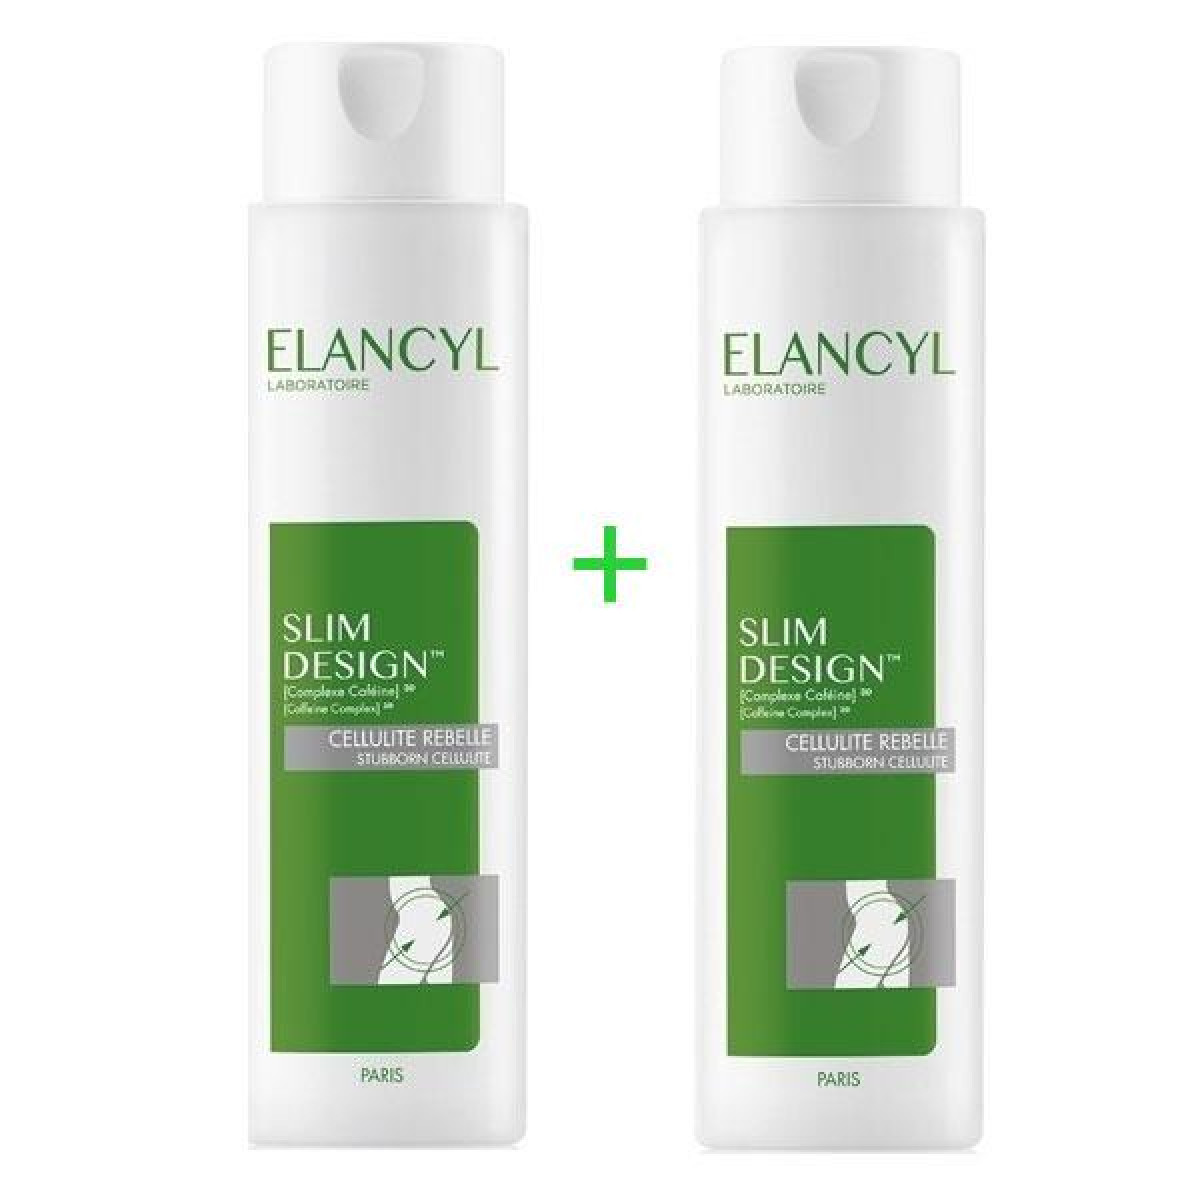 Elancyl Slim Design Cellulite Rebelle 200ml+ 200ml (Double Package -30%)